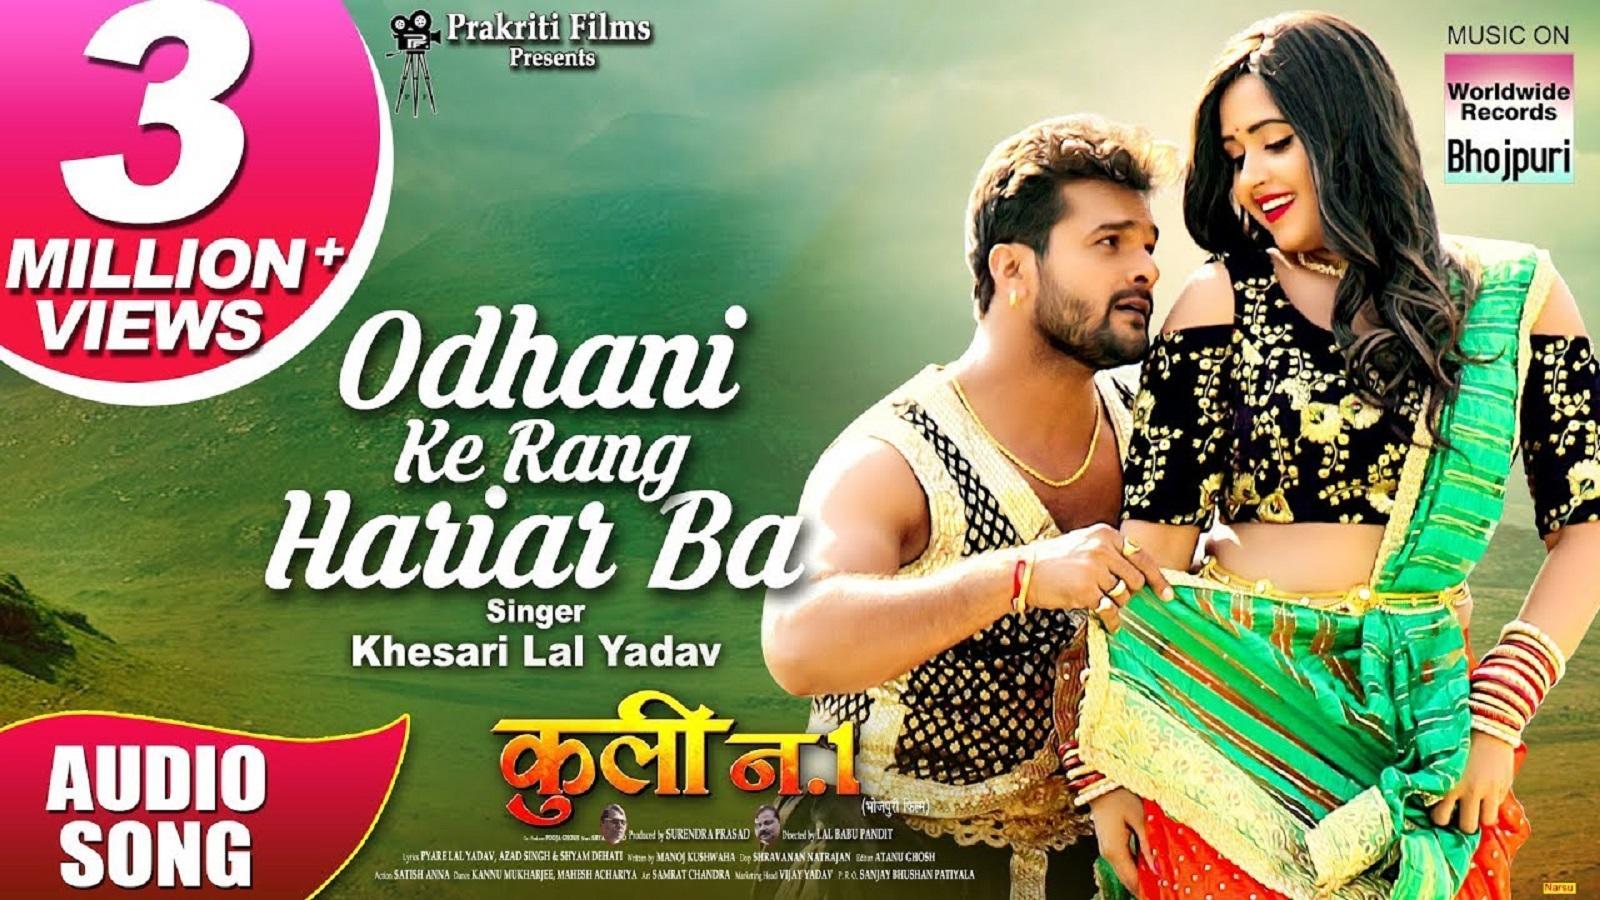 Watch: Khesari Lal Yadav and Kajal Raghwani's hit Bhojpuri song 'Odhani Ke  Rang Hariar Ba' from 'Coolie No 1'